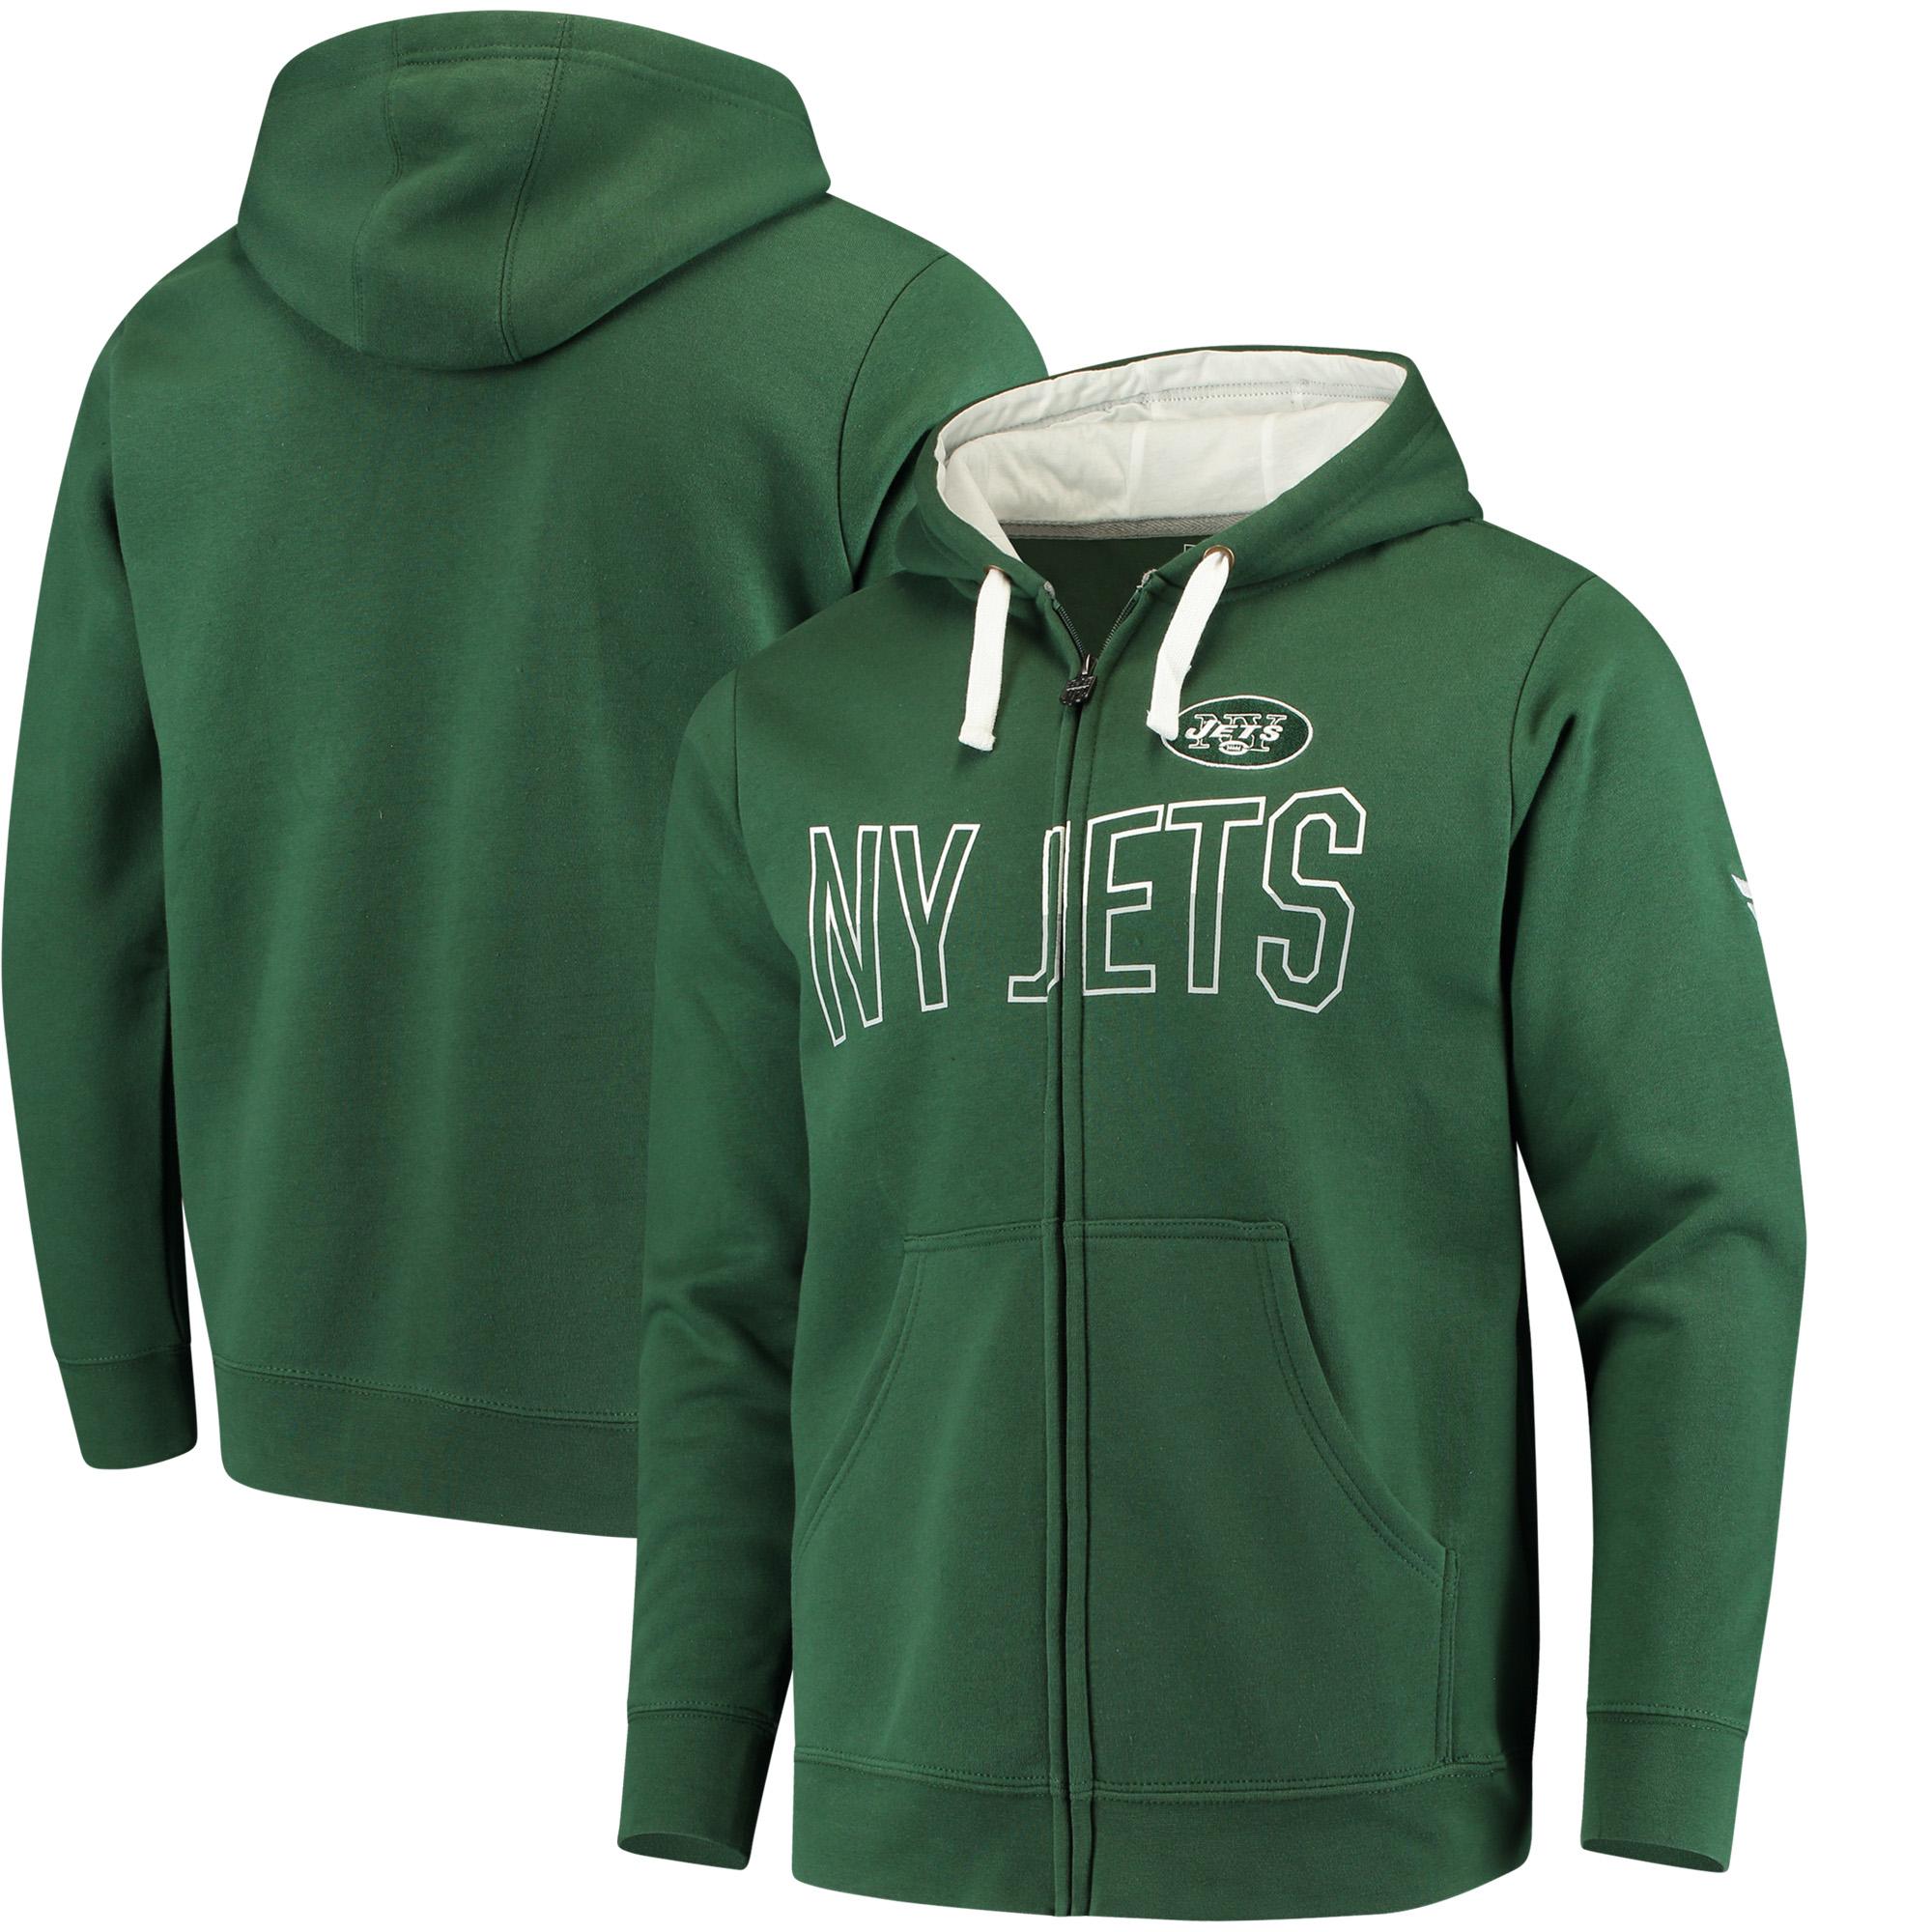 New York Jets NFL Pro Line by Fanatics Branded Iconic Fleece Full-Zip Hoodie - Green